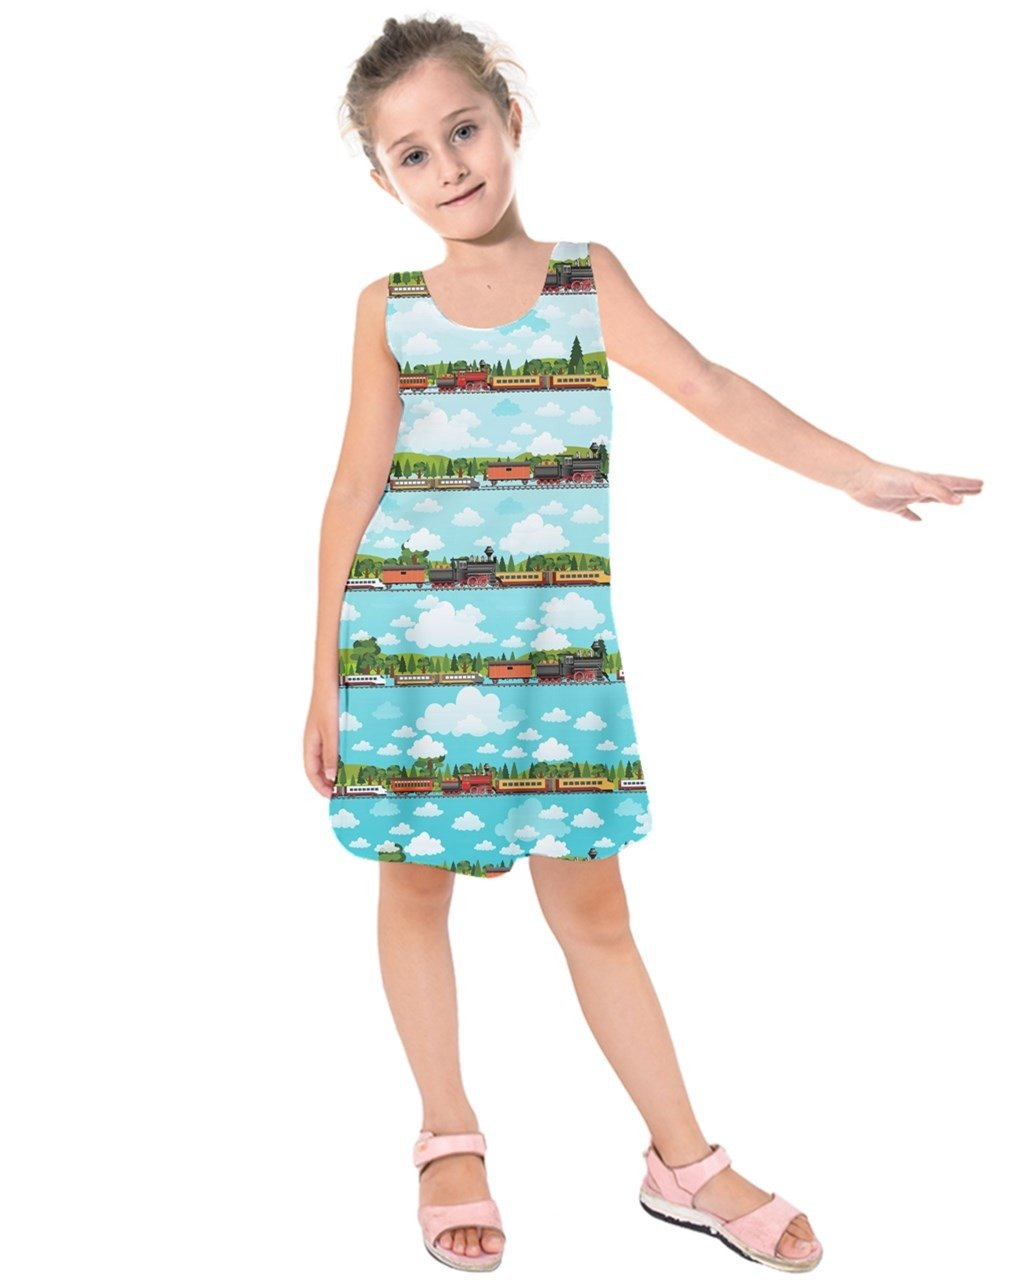 PattyCandy Girls 2-13 Years Travel by Train Kids Sleeveless Dress - 4